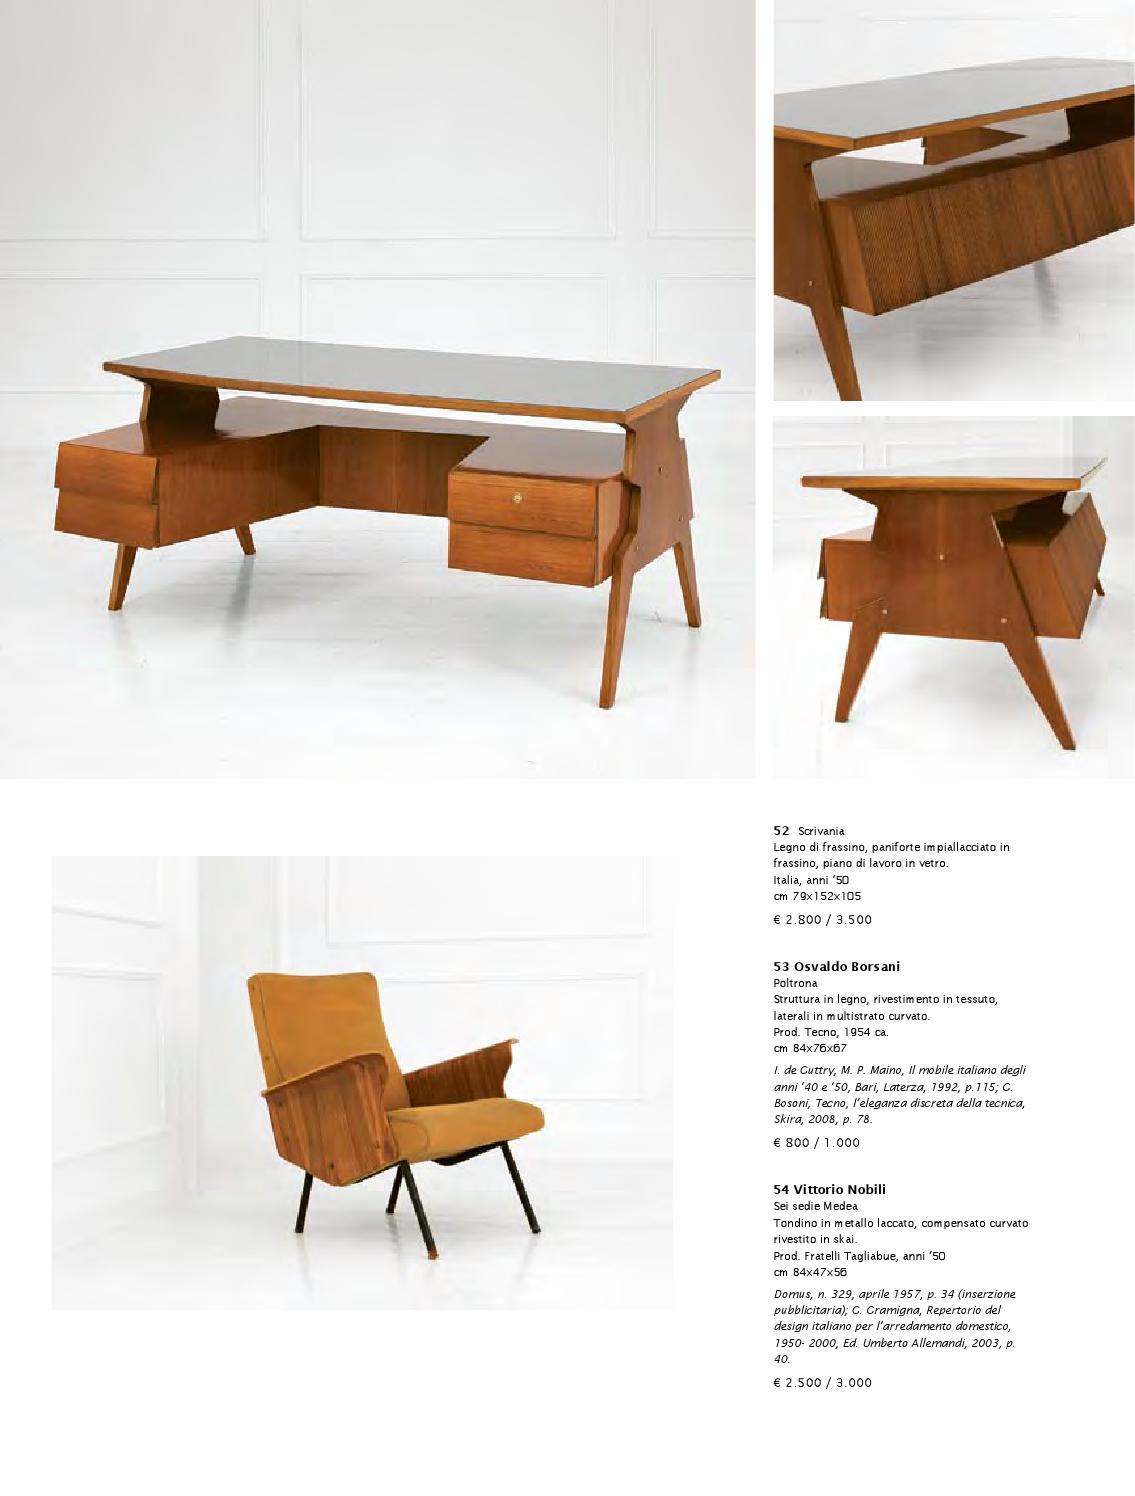 Scrivania Design Anni 50.Let Design Speak For Itself Vebuka Com